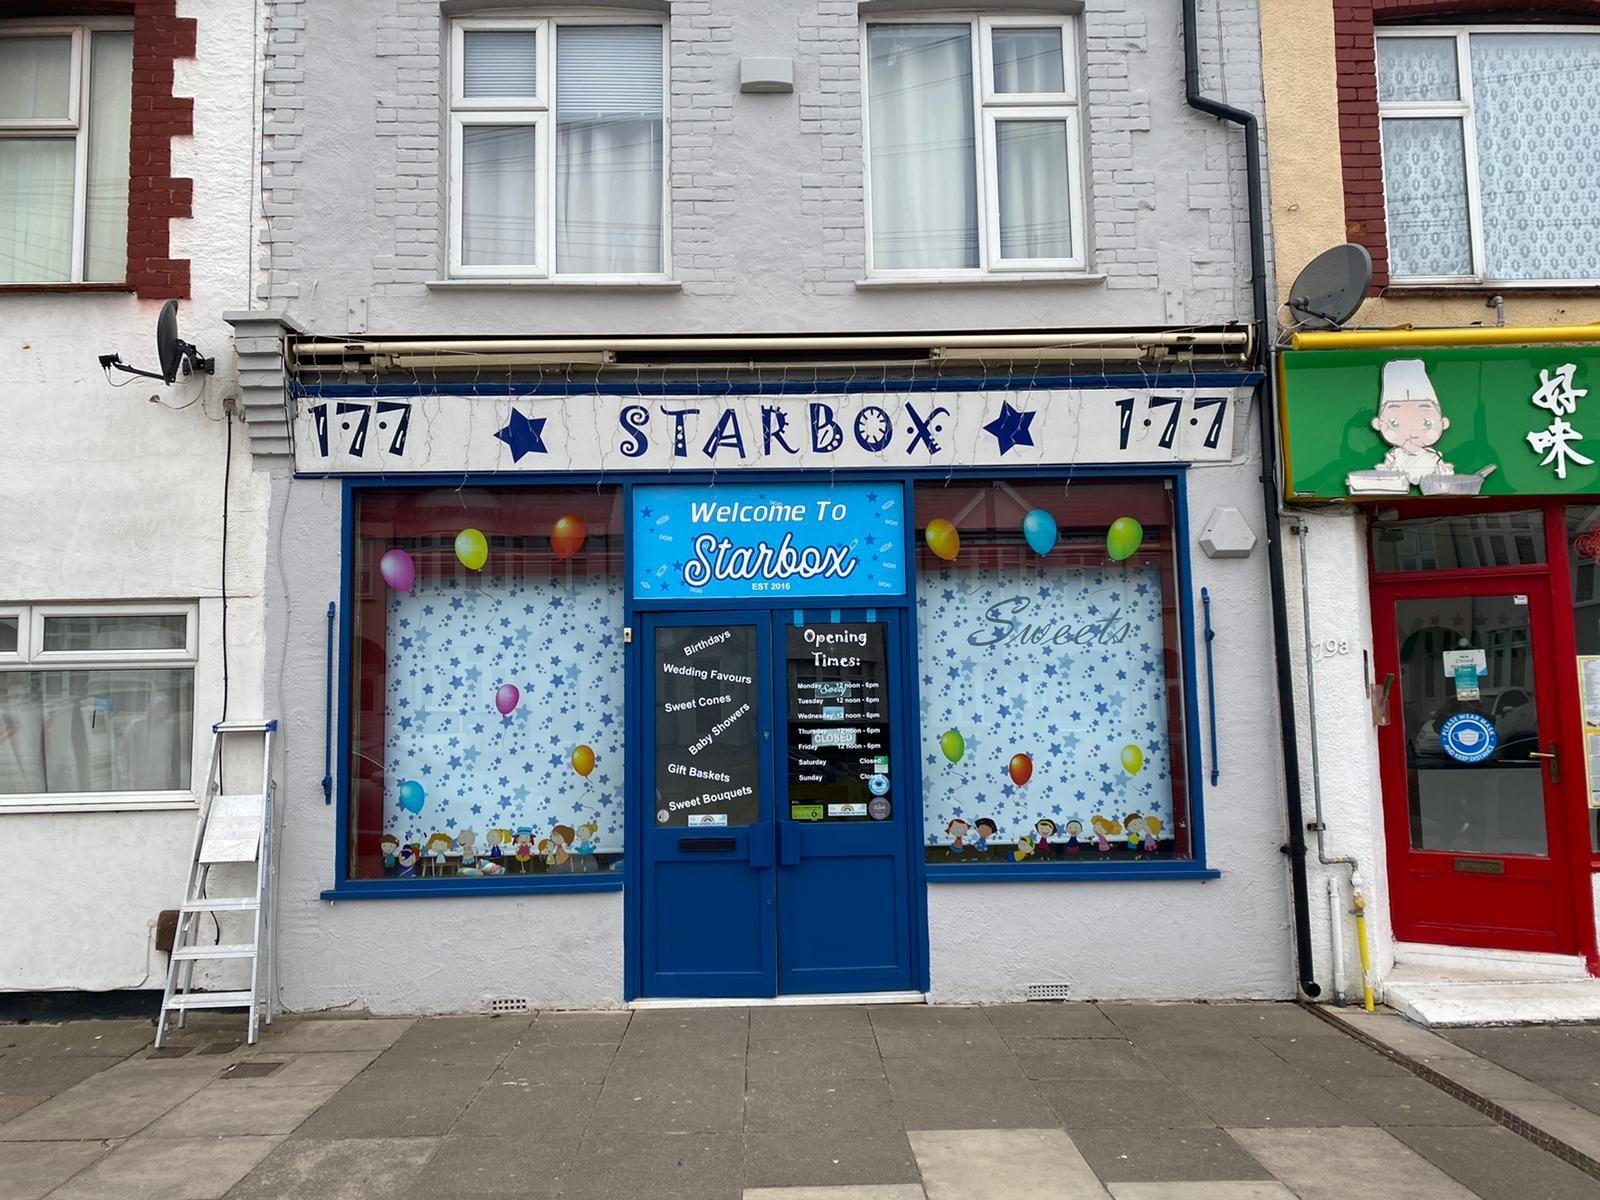 Starbox Windows